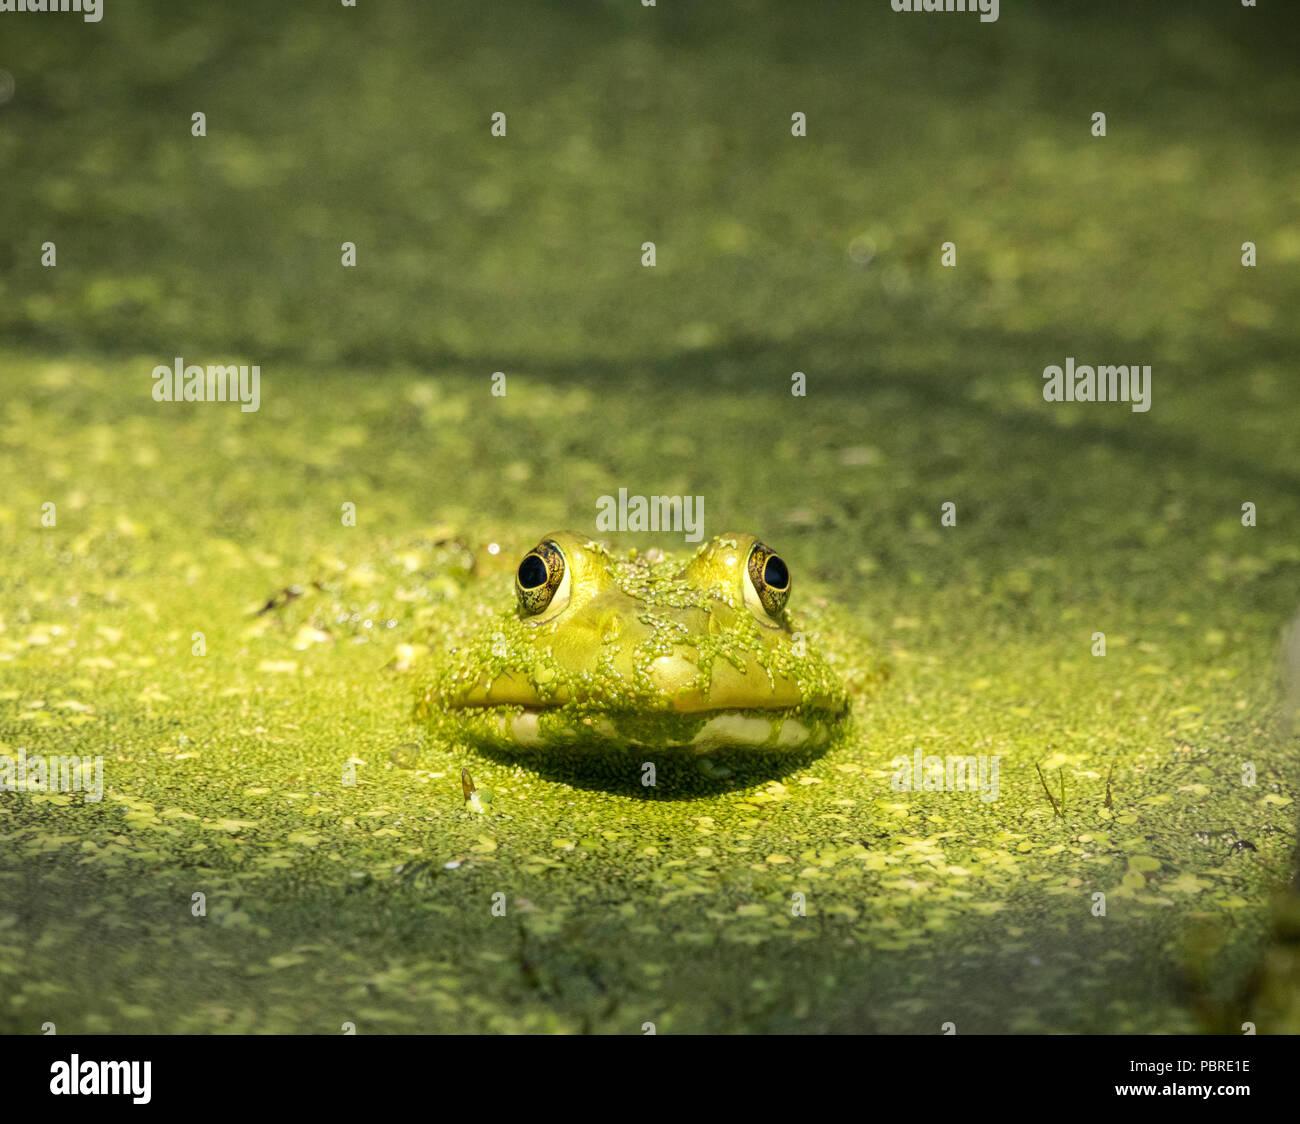 Frog in full camo - Stock Image